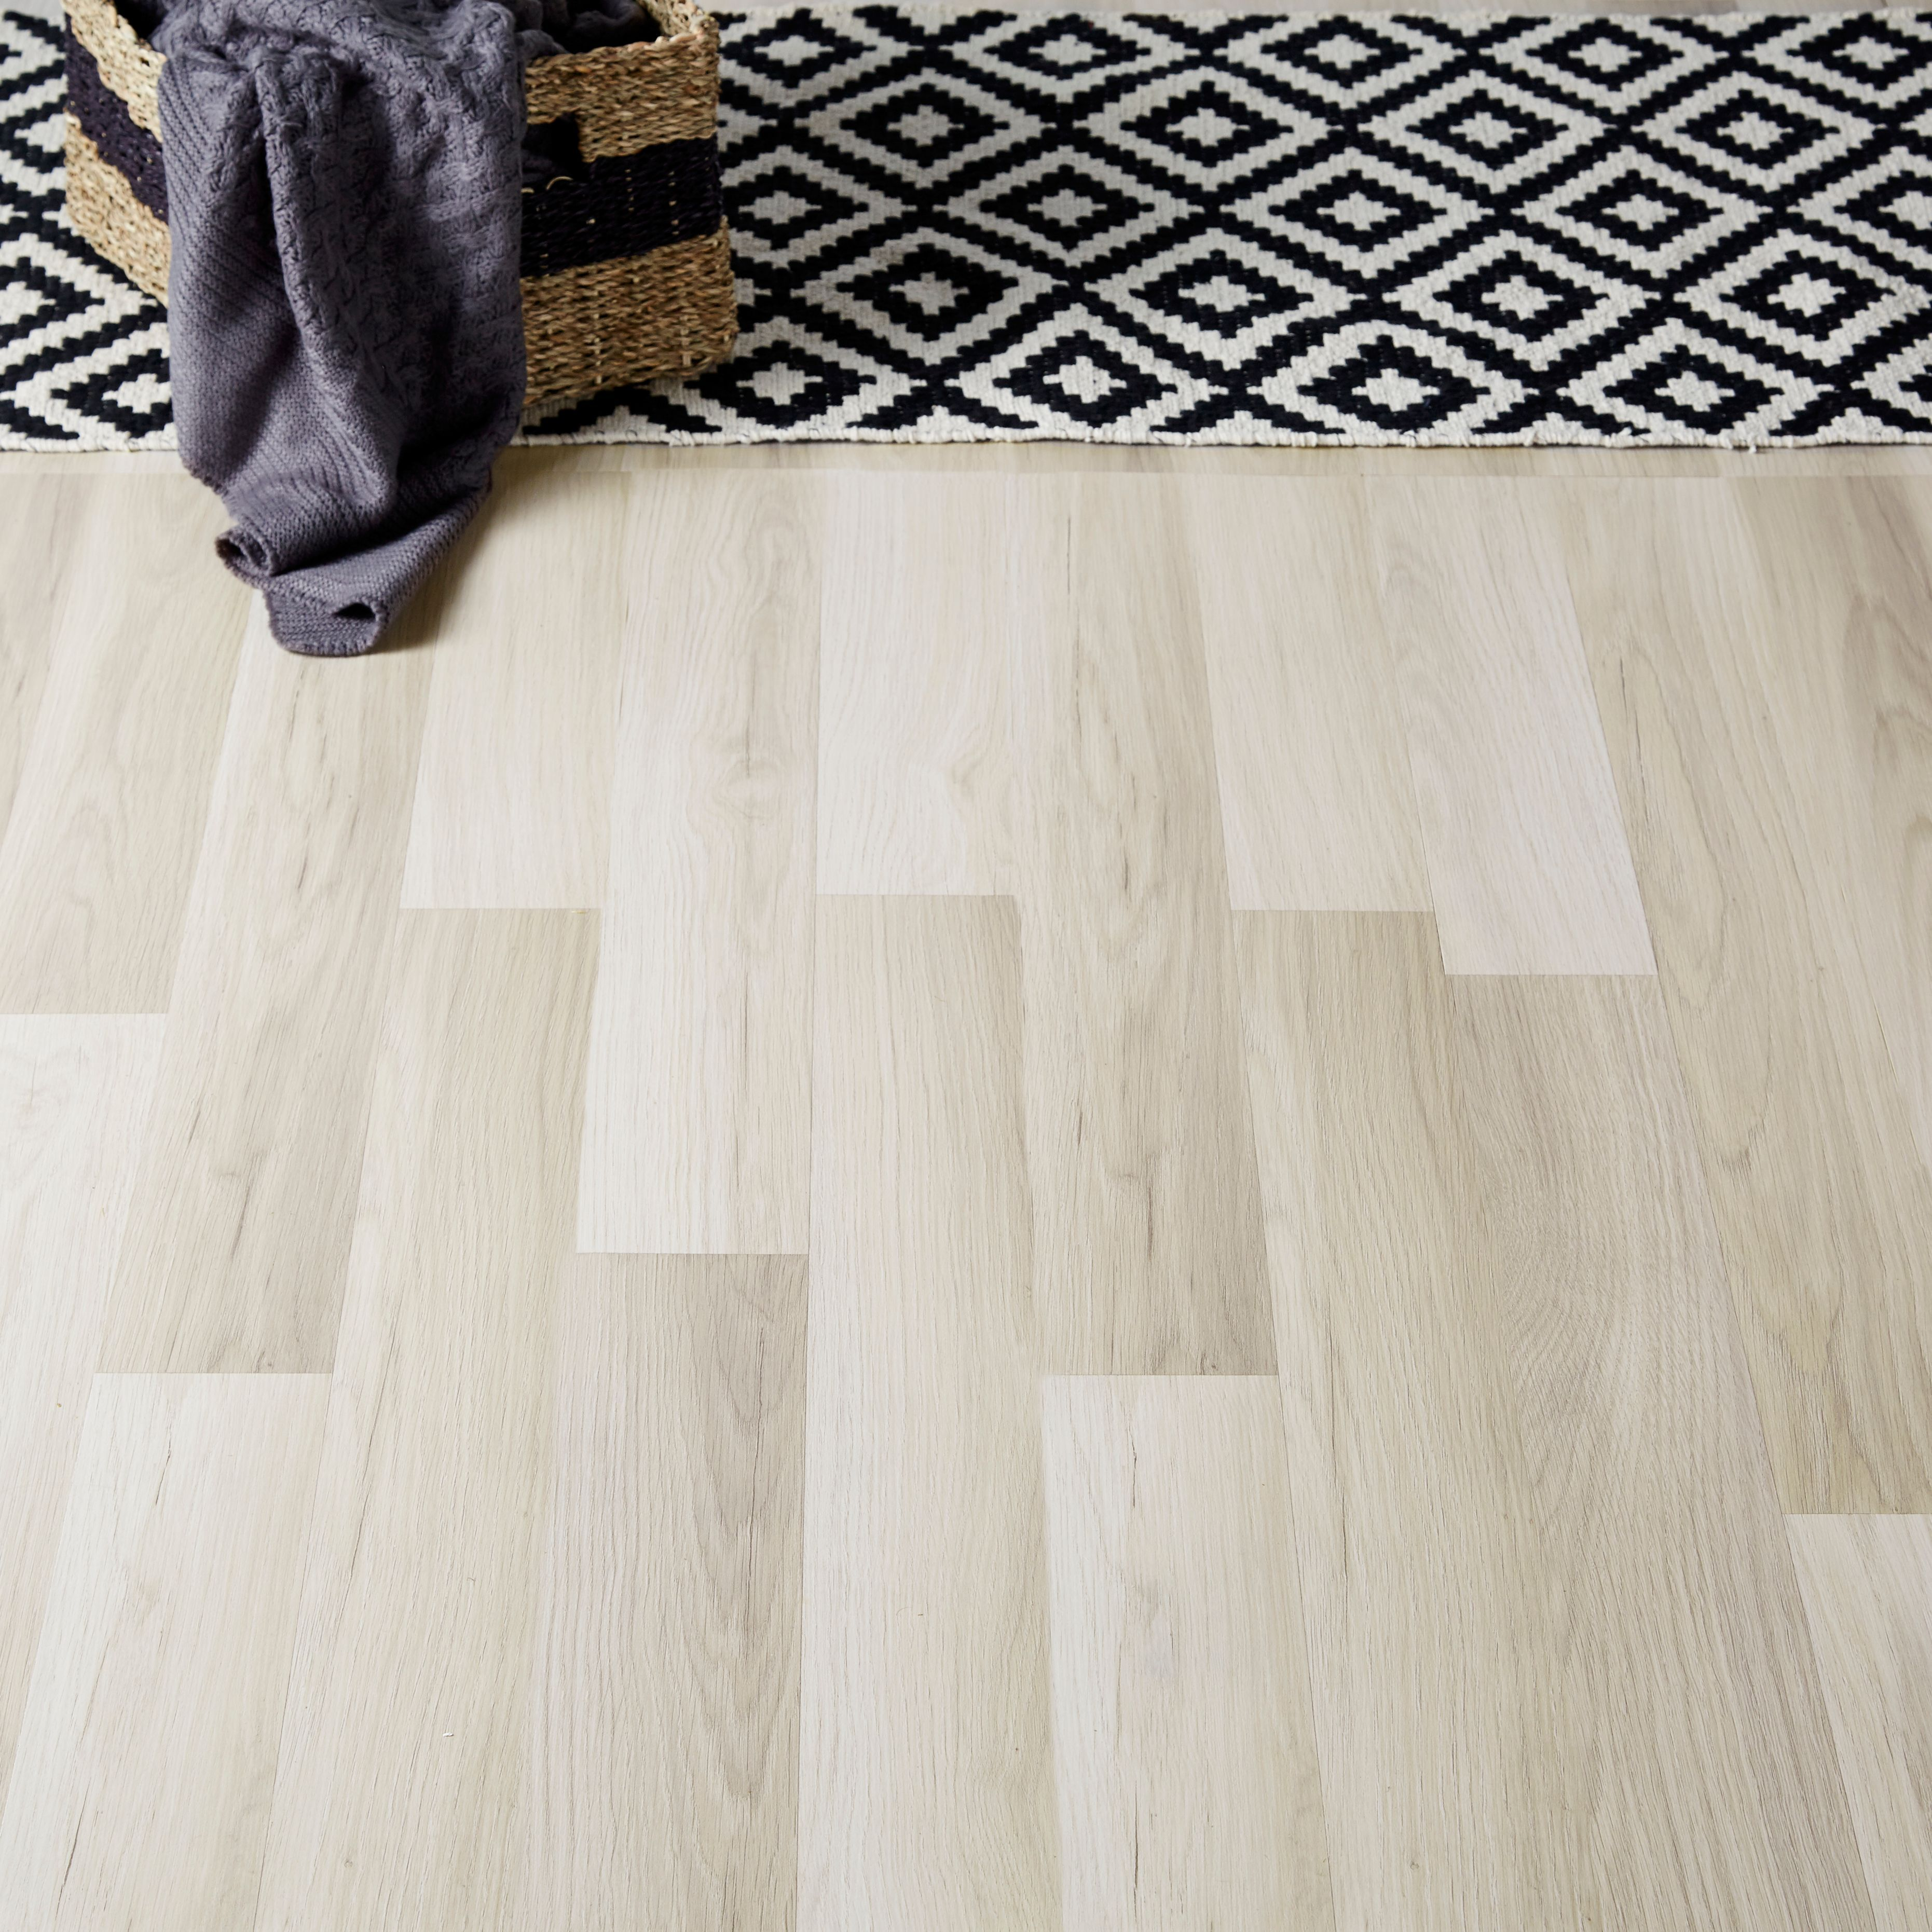 Townsville Grey Oak Effect Laminate Flooring 2.467 M² Pack